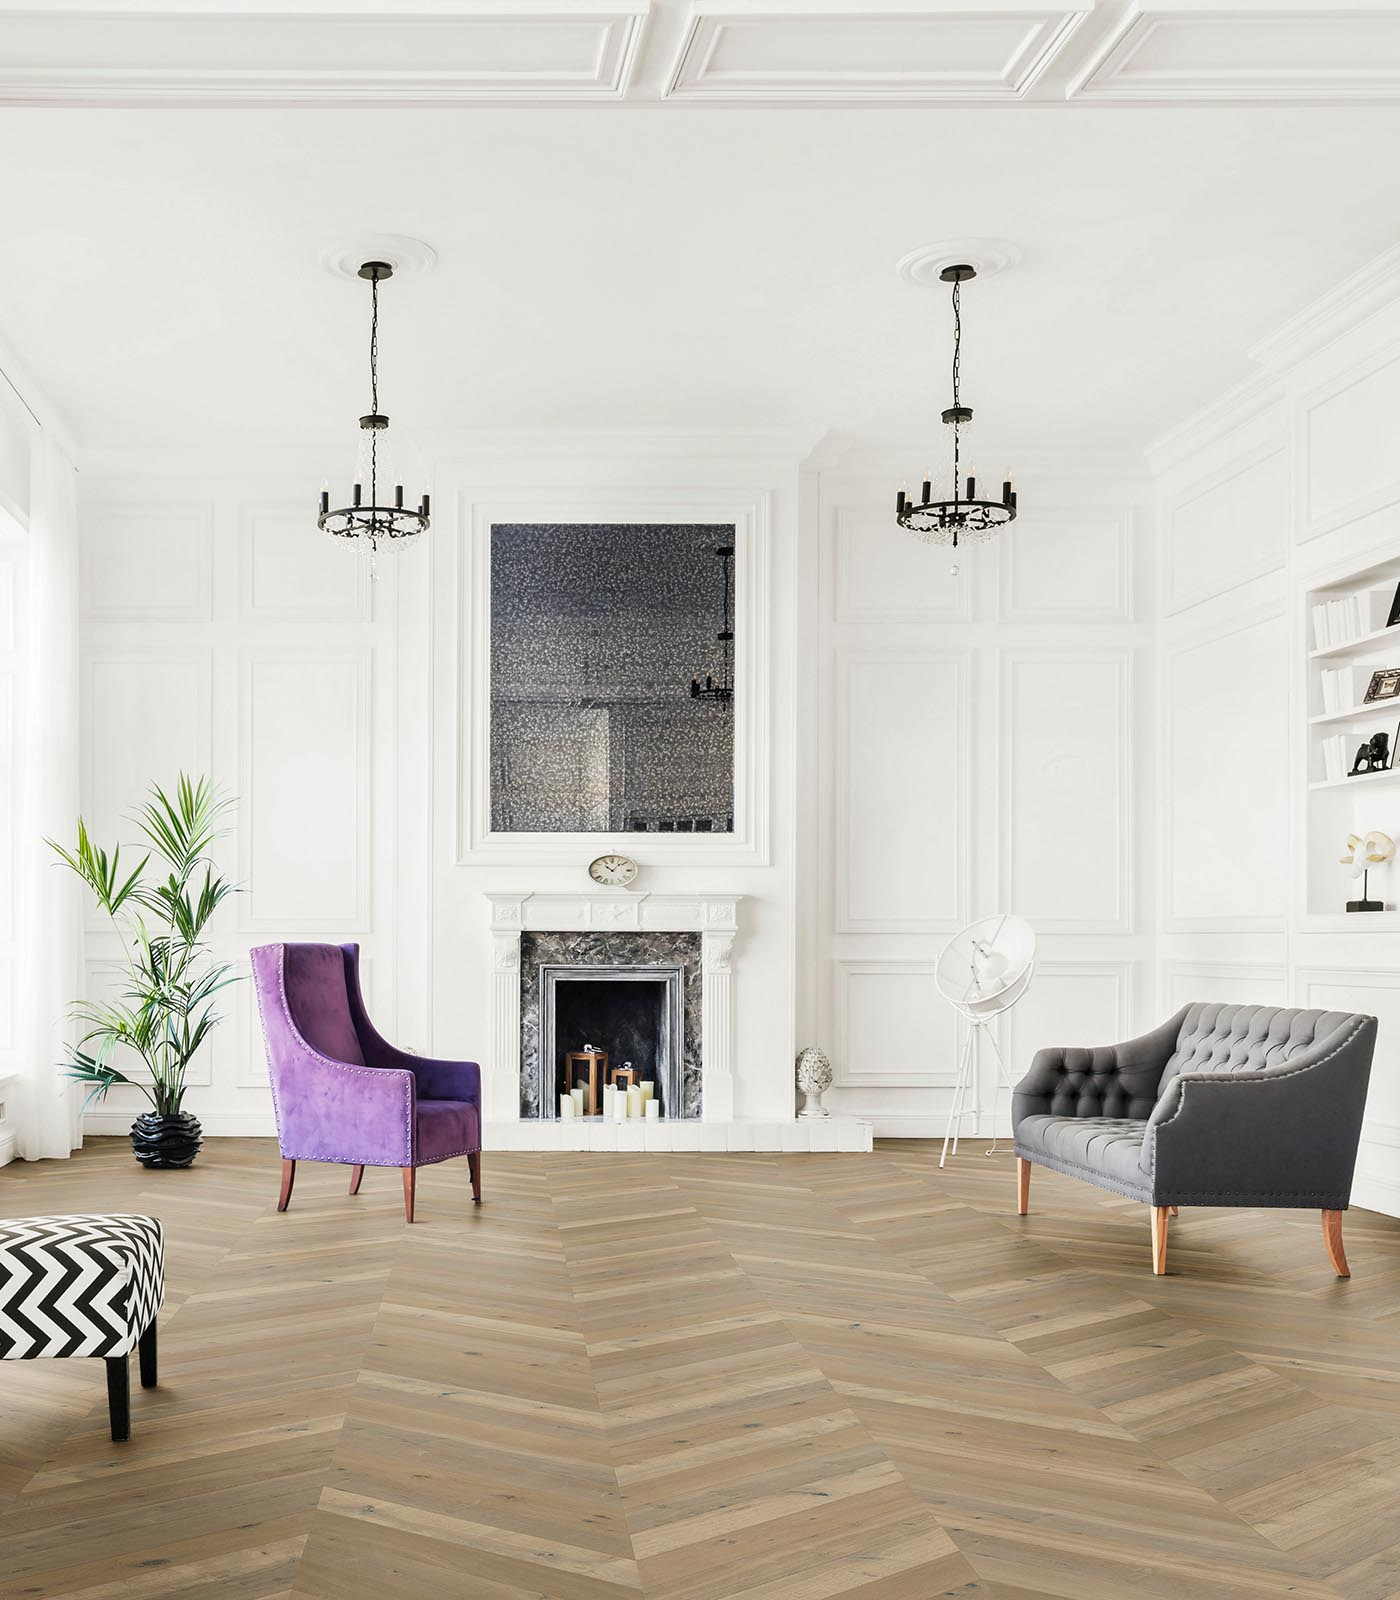 St Moritz-Lifestyle Collection-engineered European Oak floors